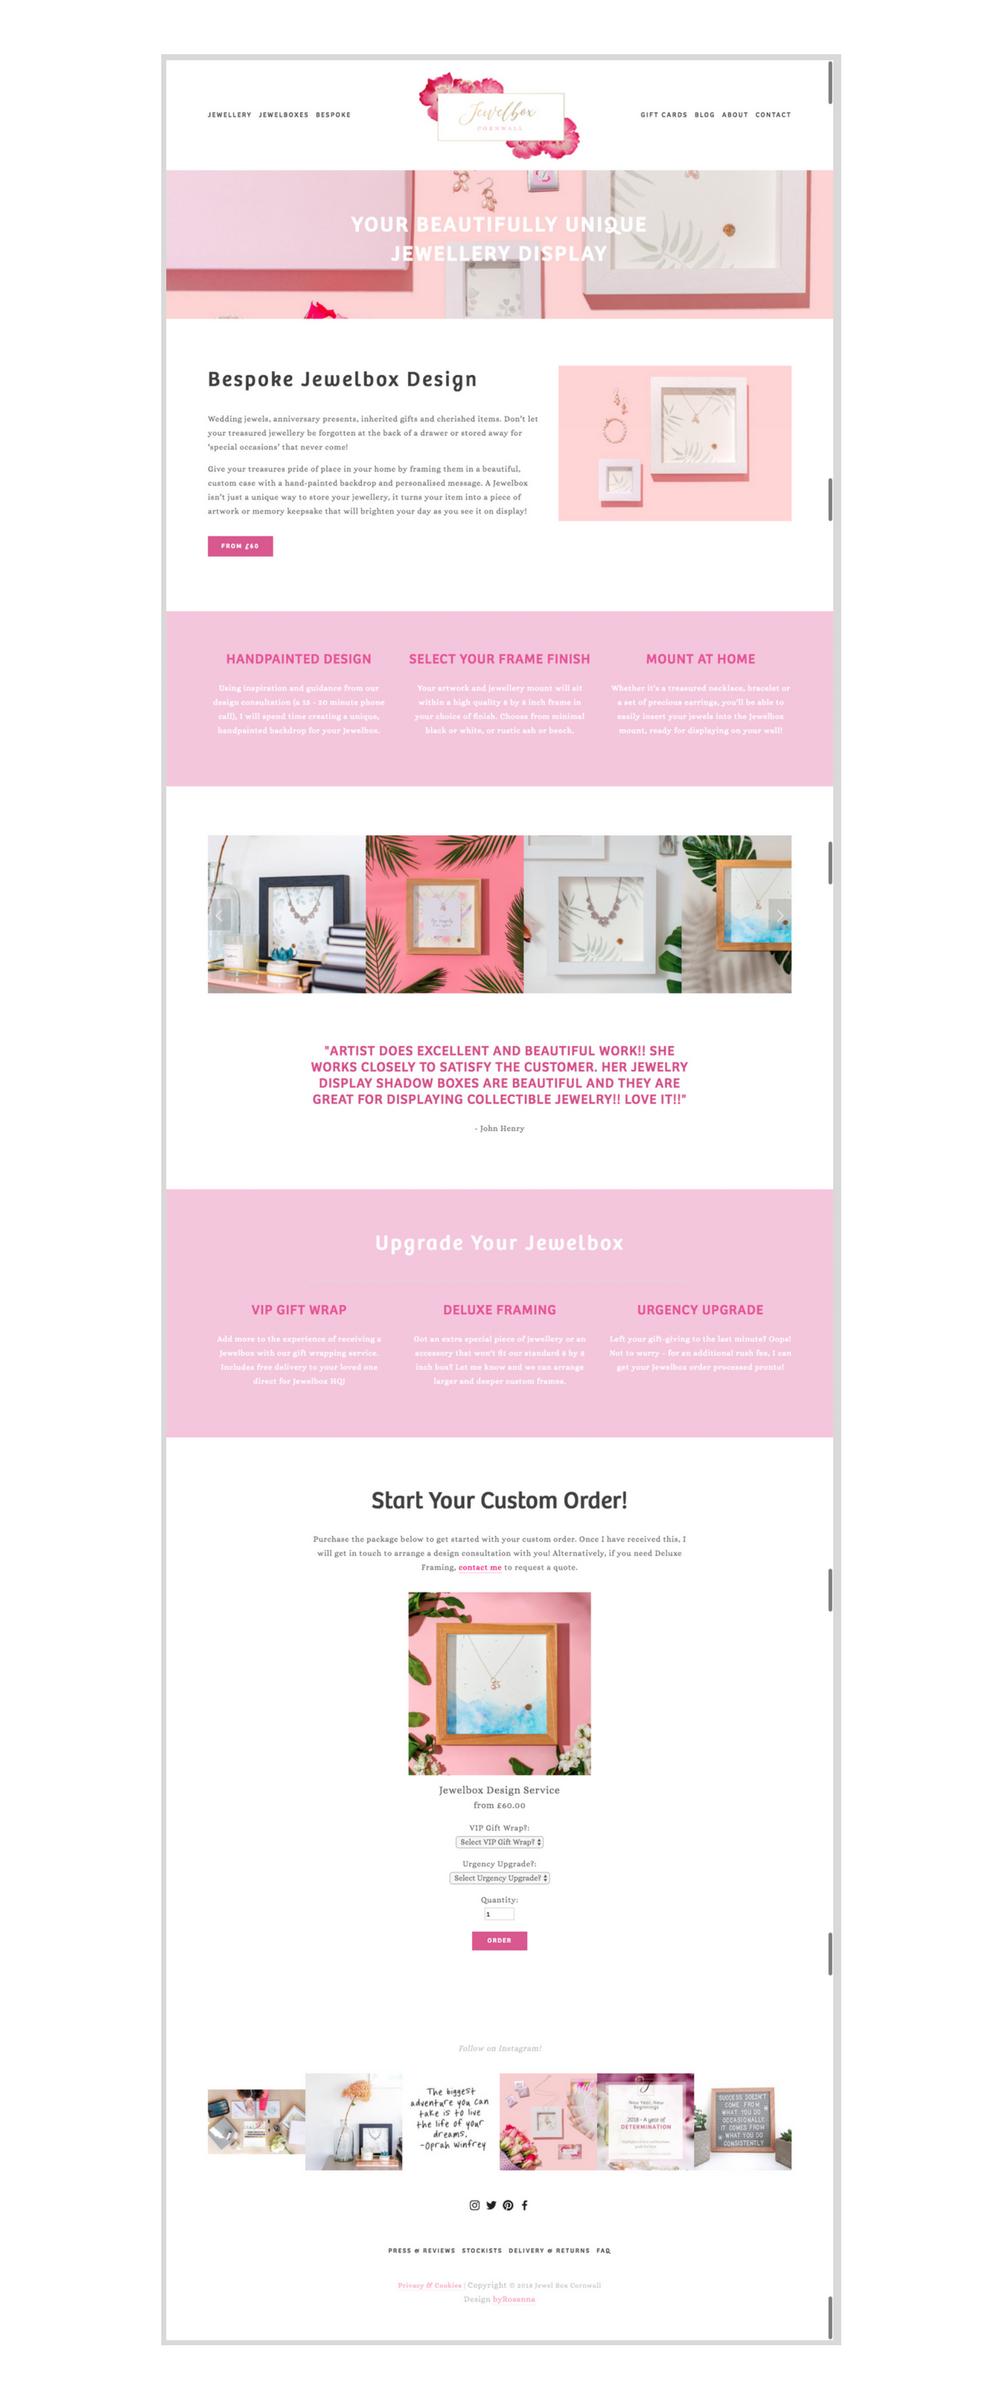 Jewelbox Cornwall S Brand New Look And Design Service Byrosanna Squarespace Website Design Branding Uk Squarespace Website Design Website Design Service Design